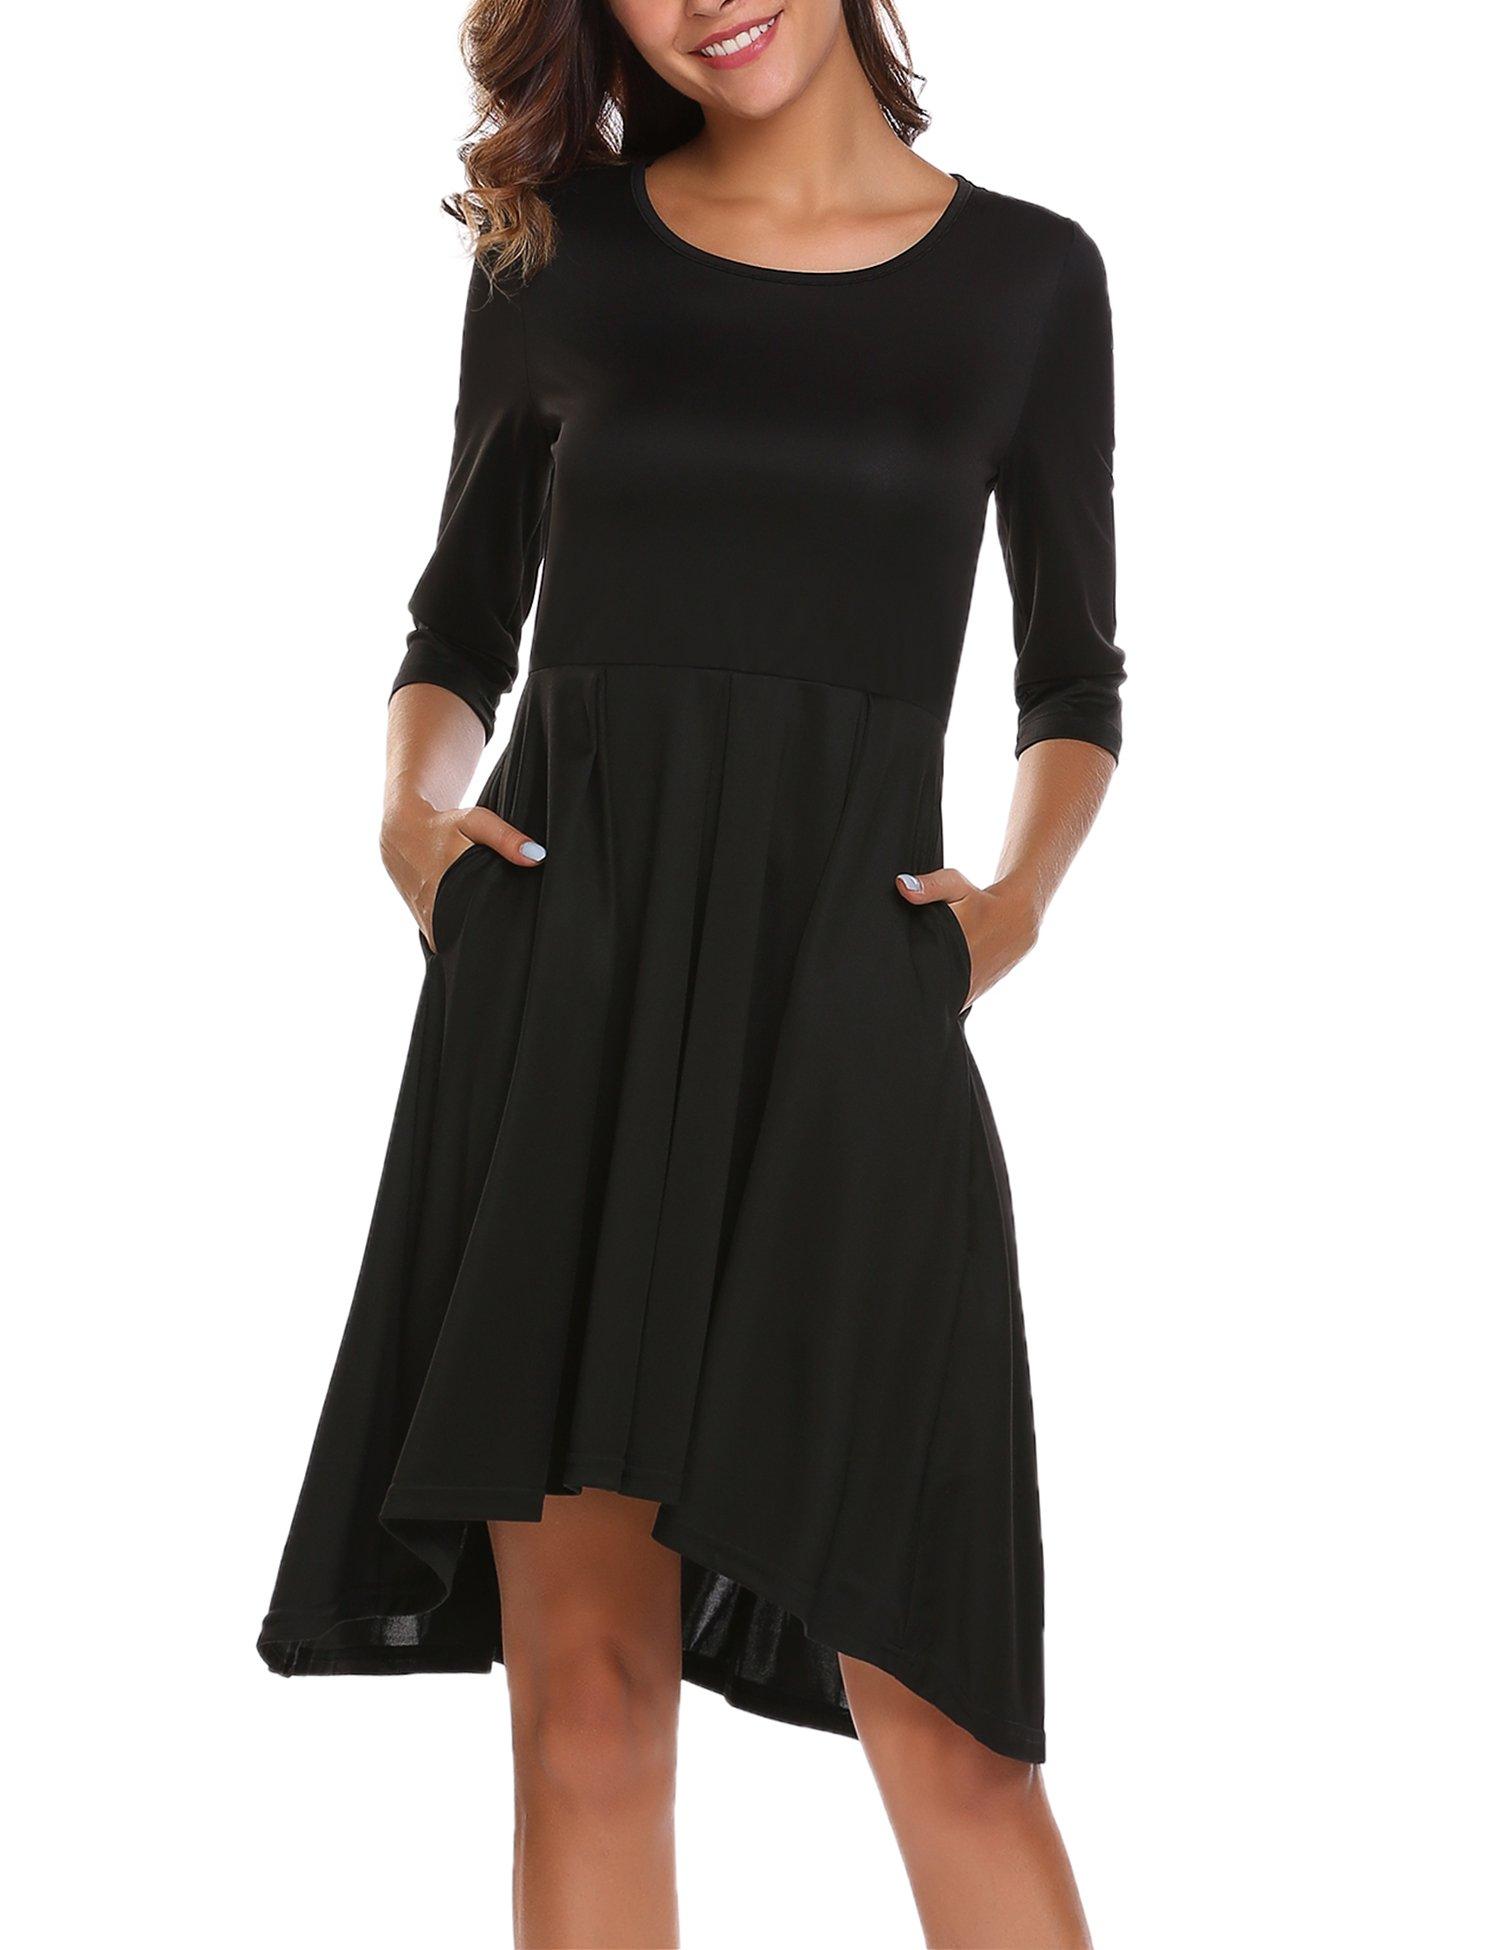 ACEVOG Women's 3/4 Sleeve Irregular Hem Pockets Pleated Casual Swing Dress (Black,S)